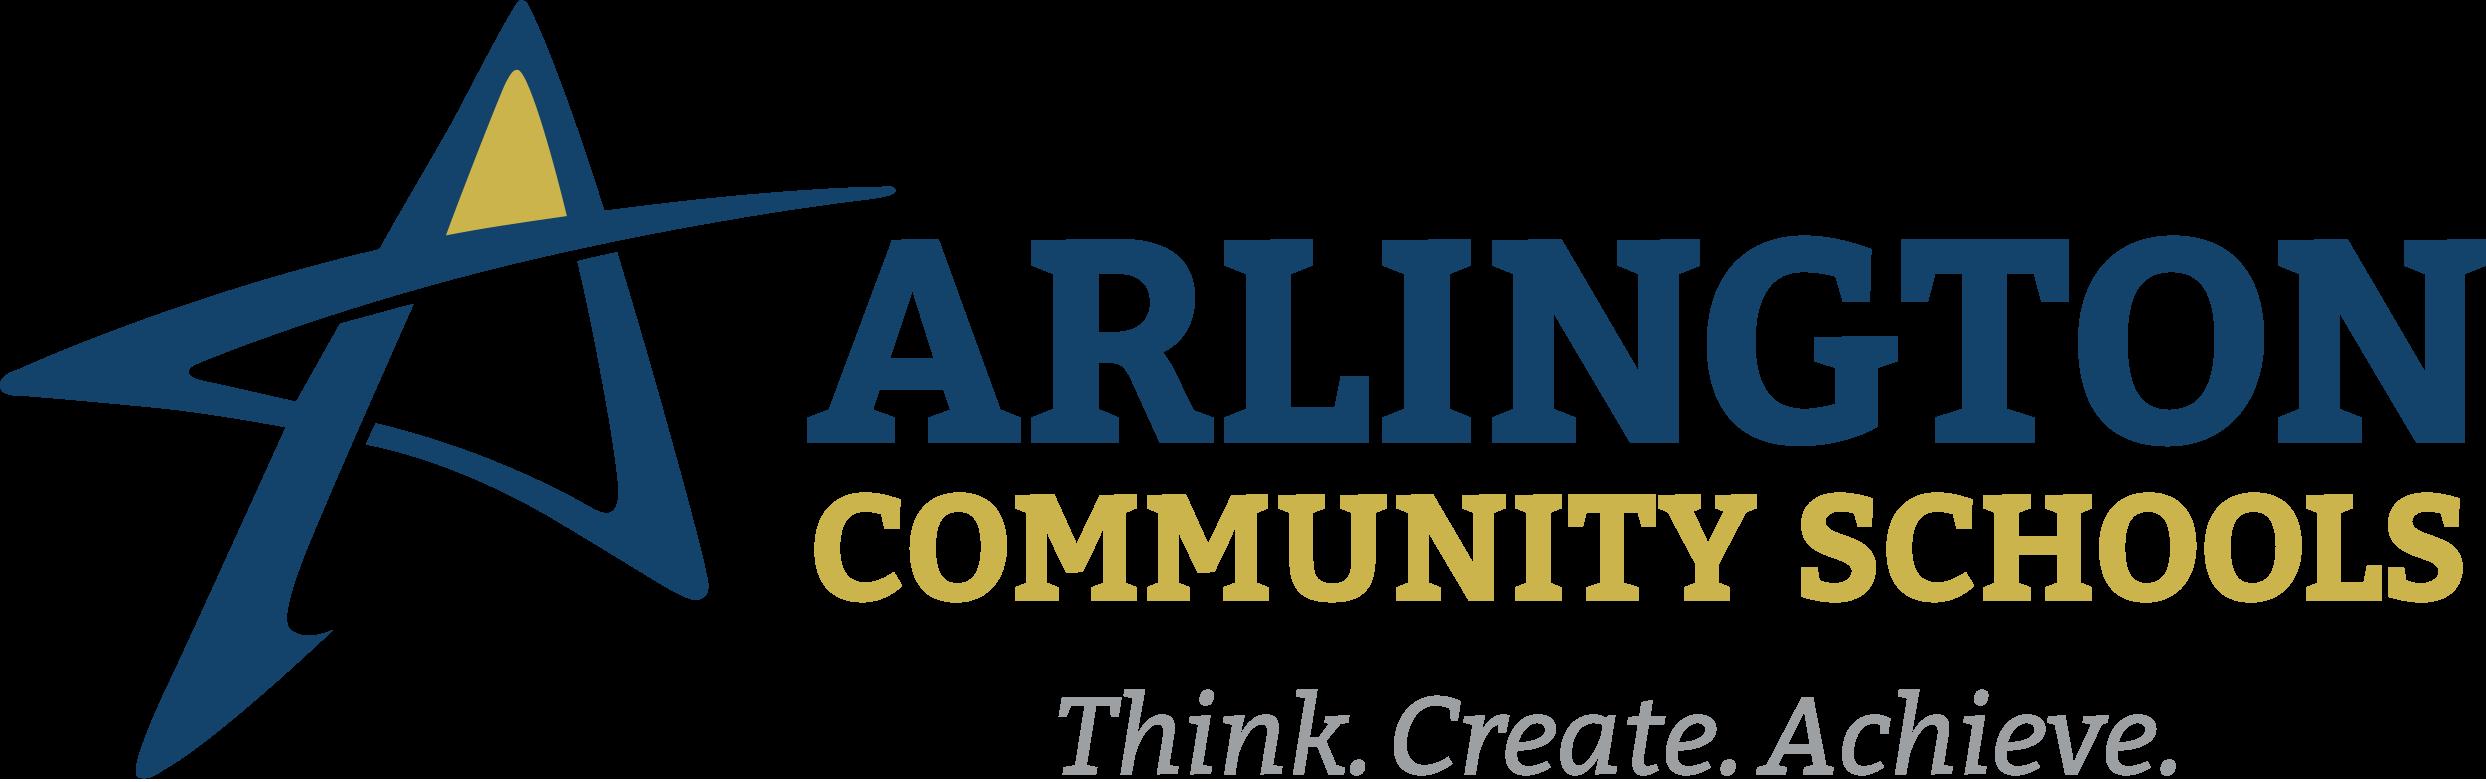 Arlington Community Schools logo